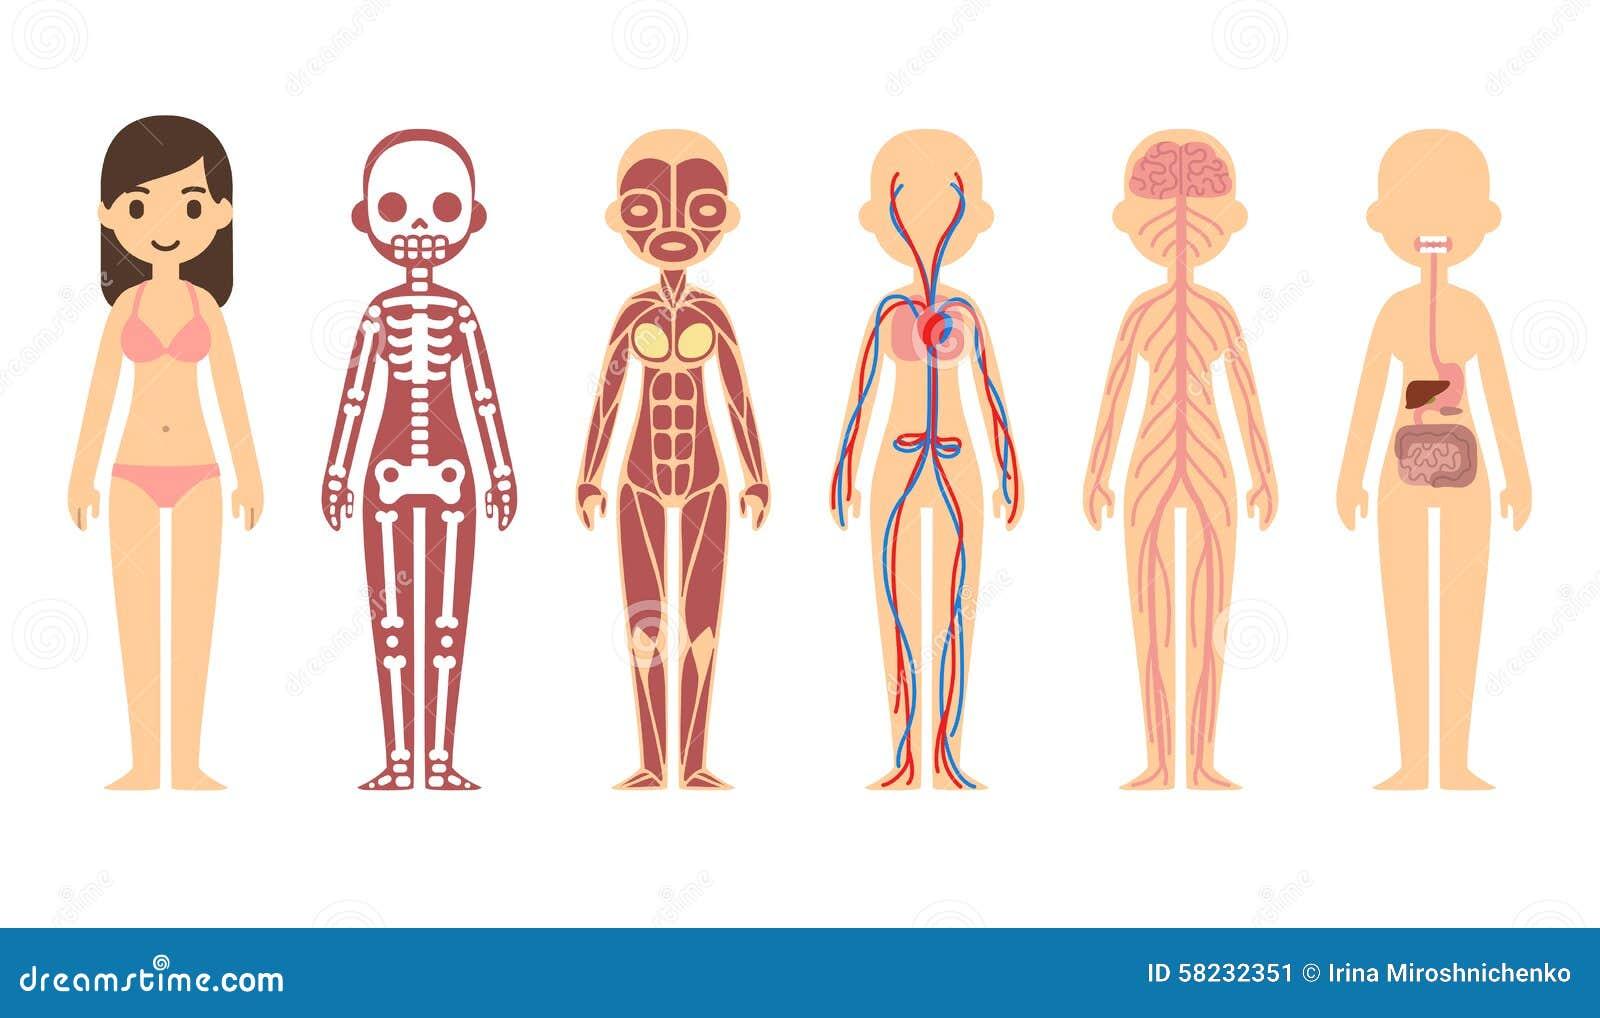 Simple Human Organ Diagram Crazywidowfo